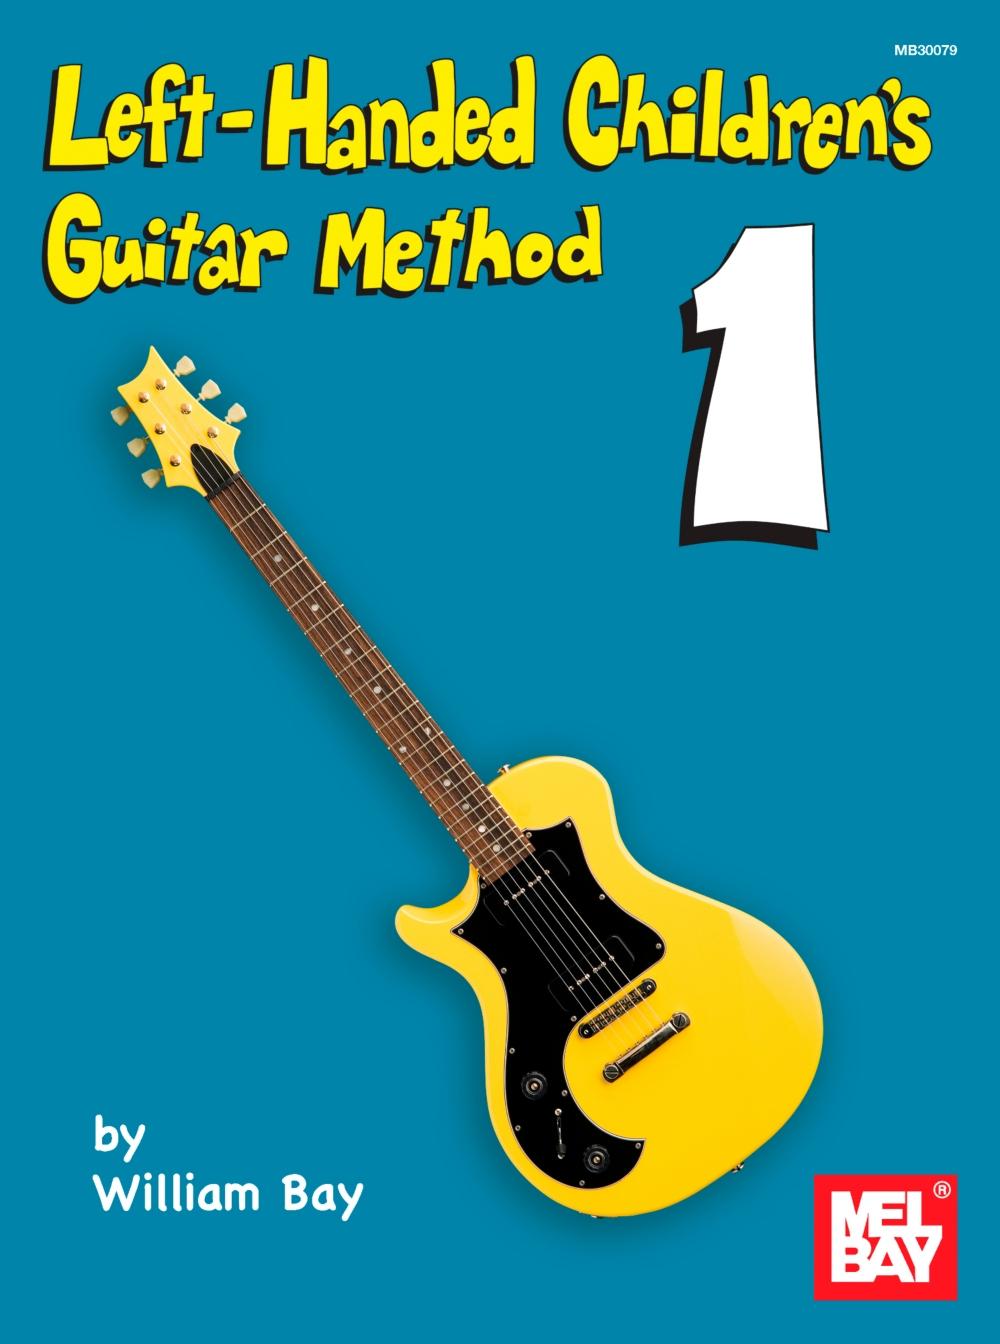 Mel Bay Left-Handed Children's Guitar Method by